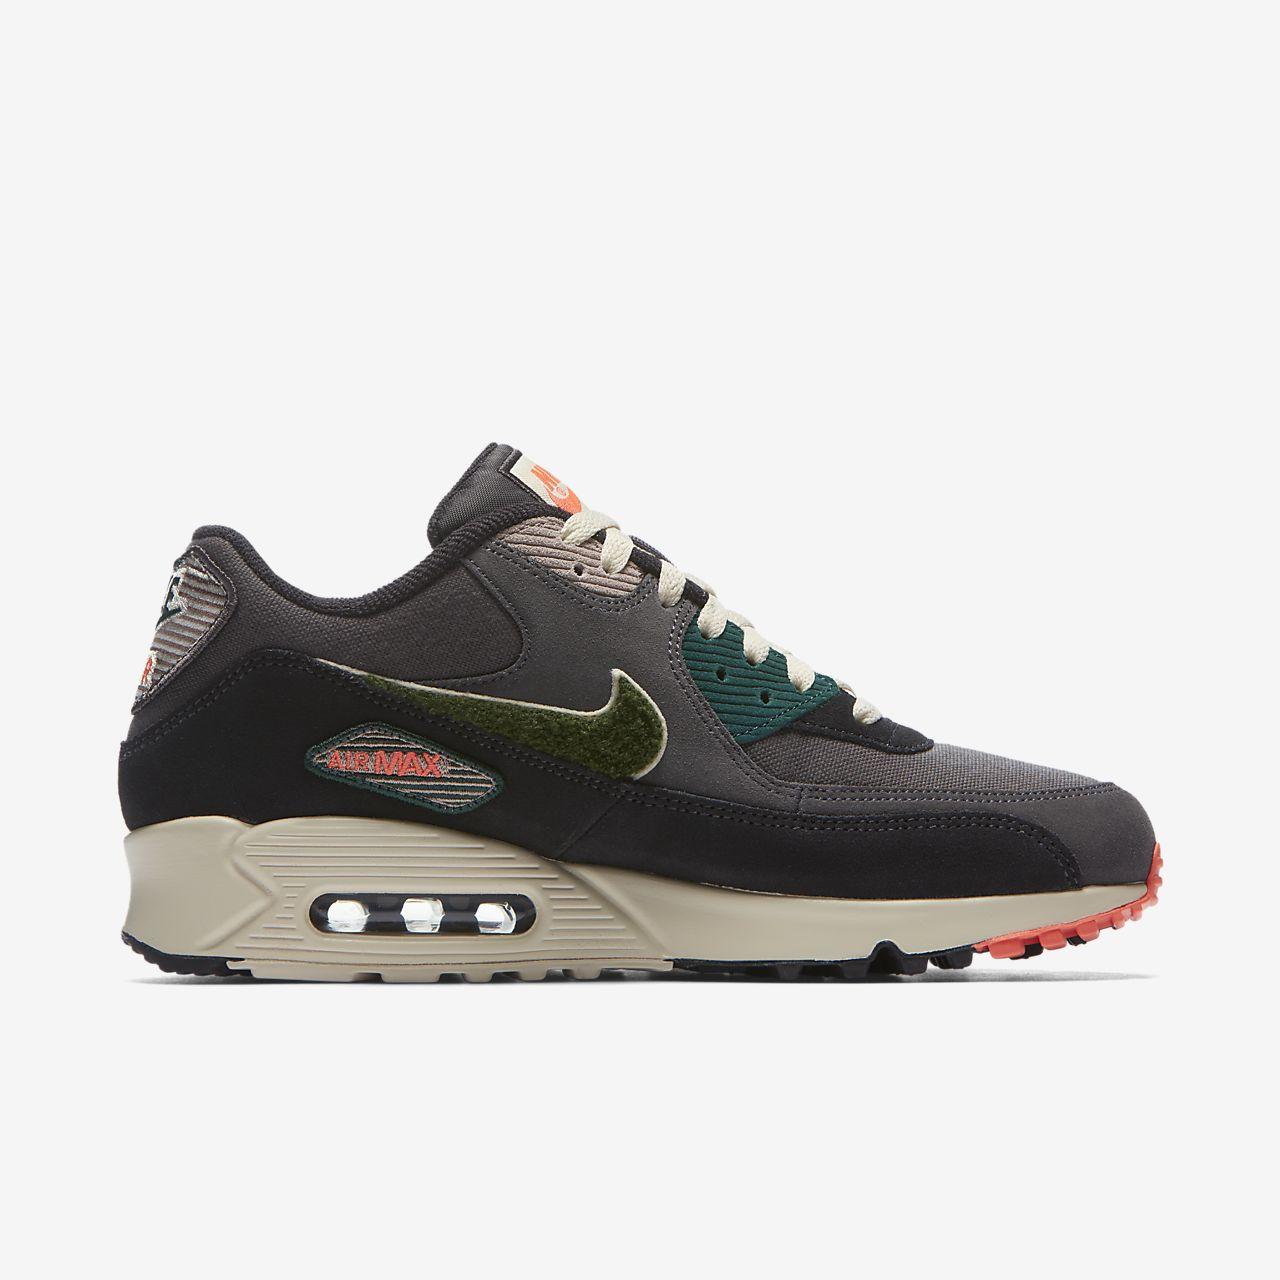 97080388f7a Nike Air Max 90 Premium SE Men s Shoe. Nike.com NL